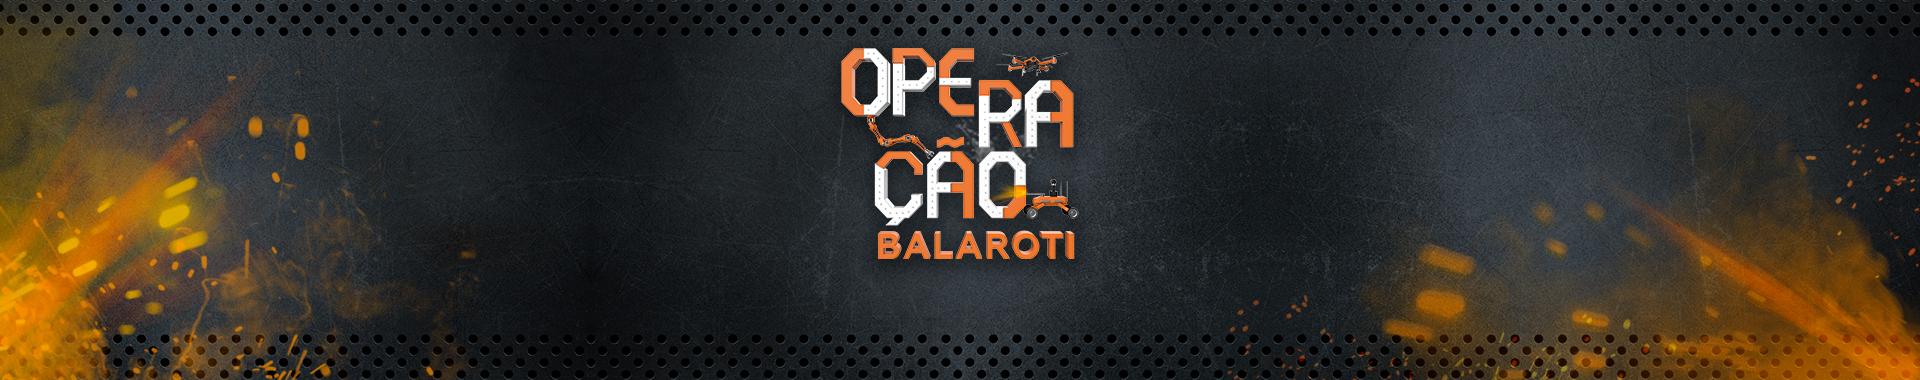 OperaçãoBalaroti